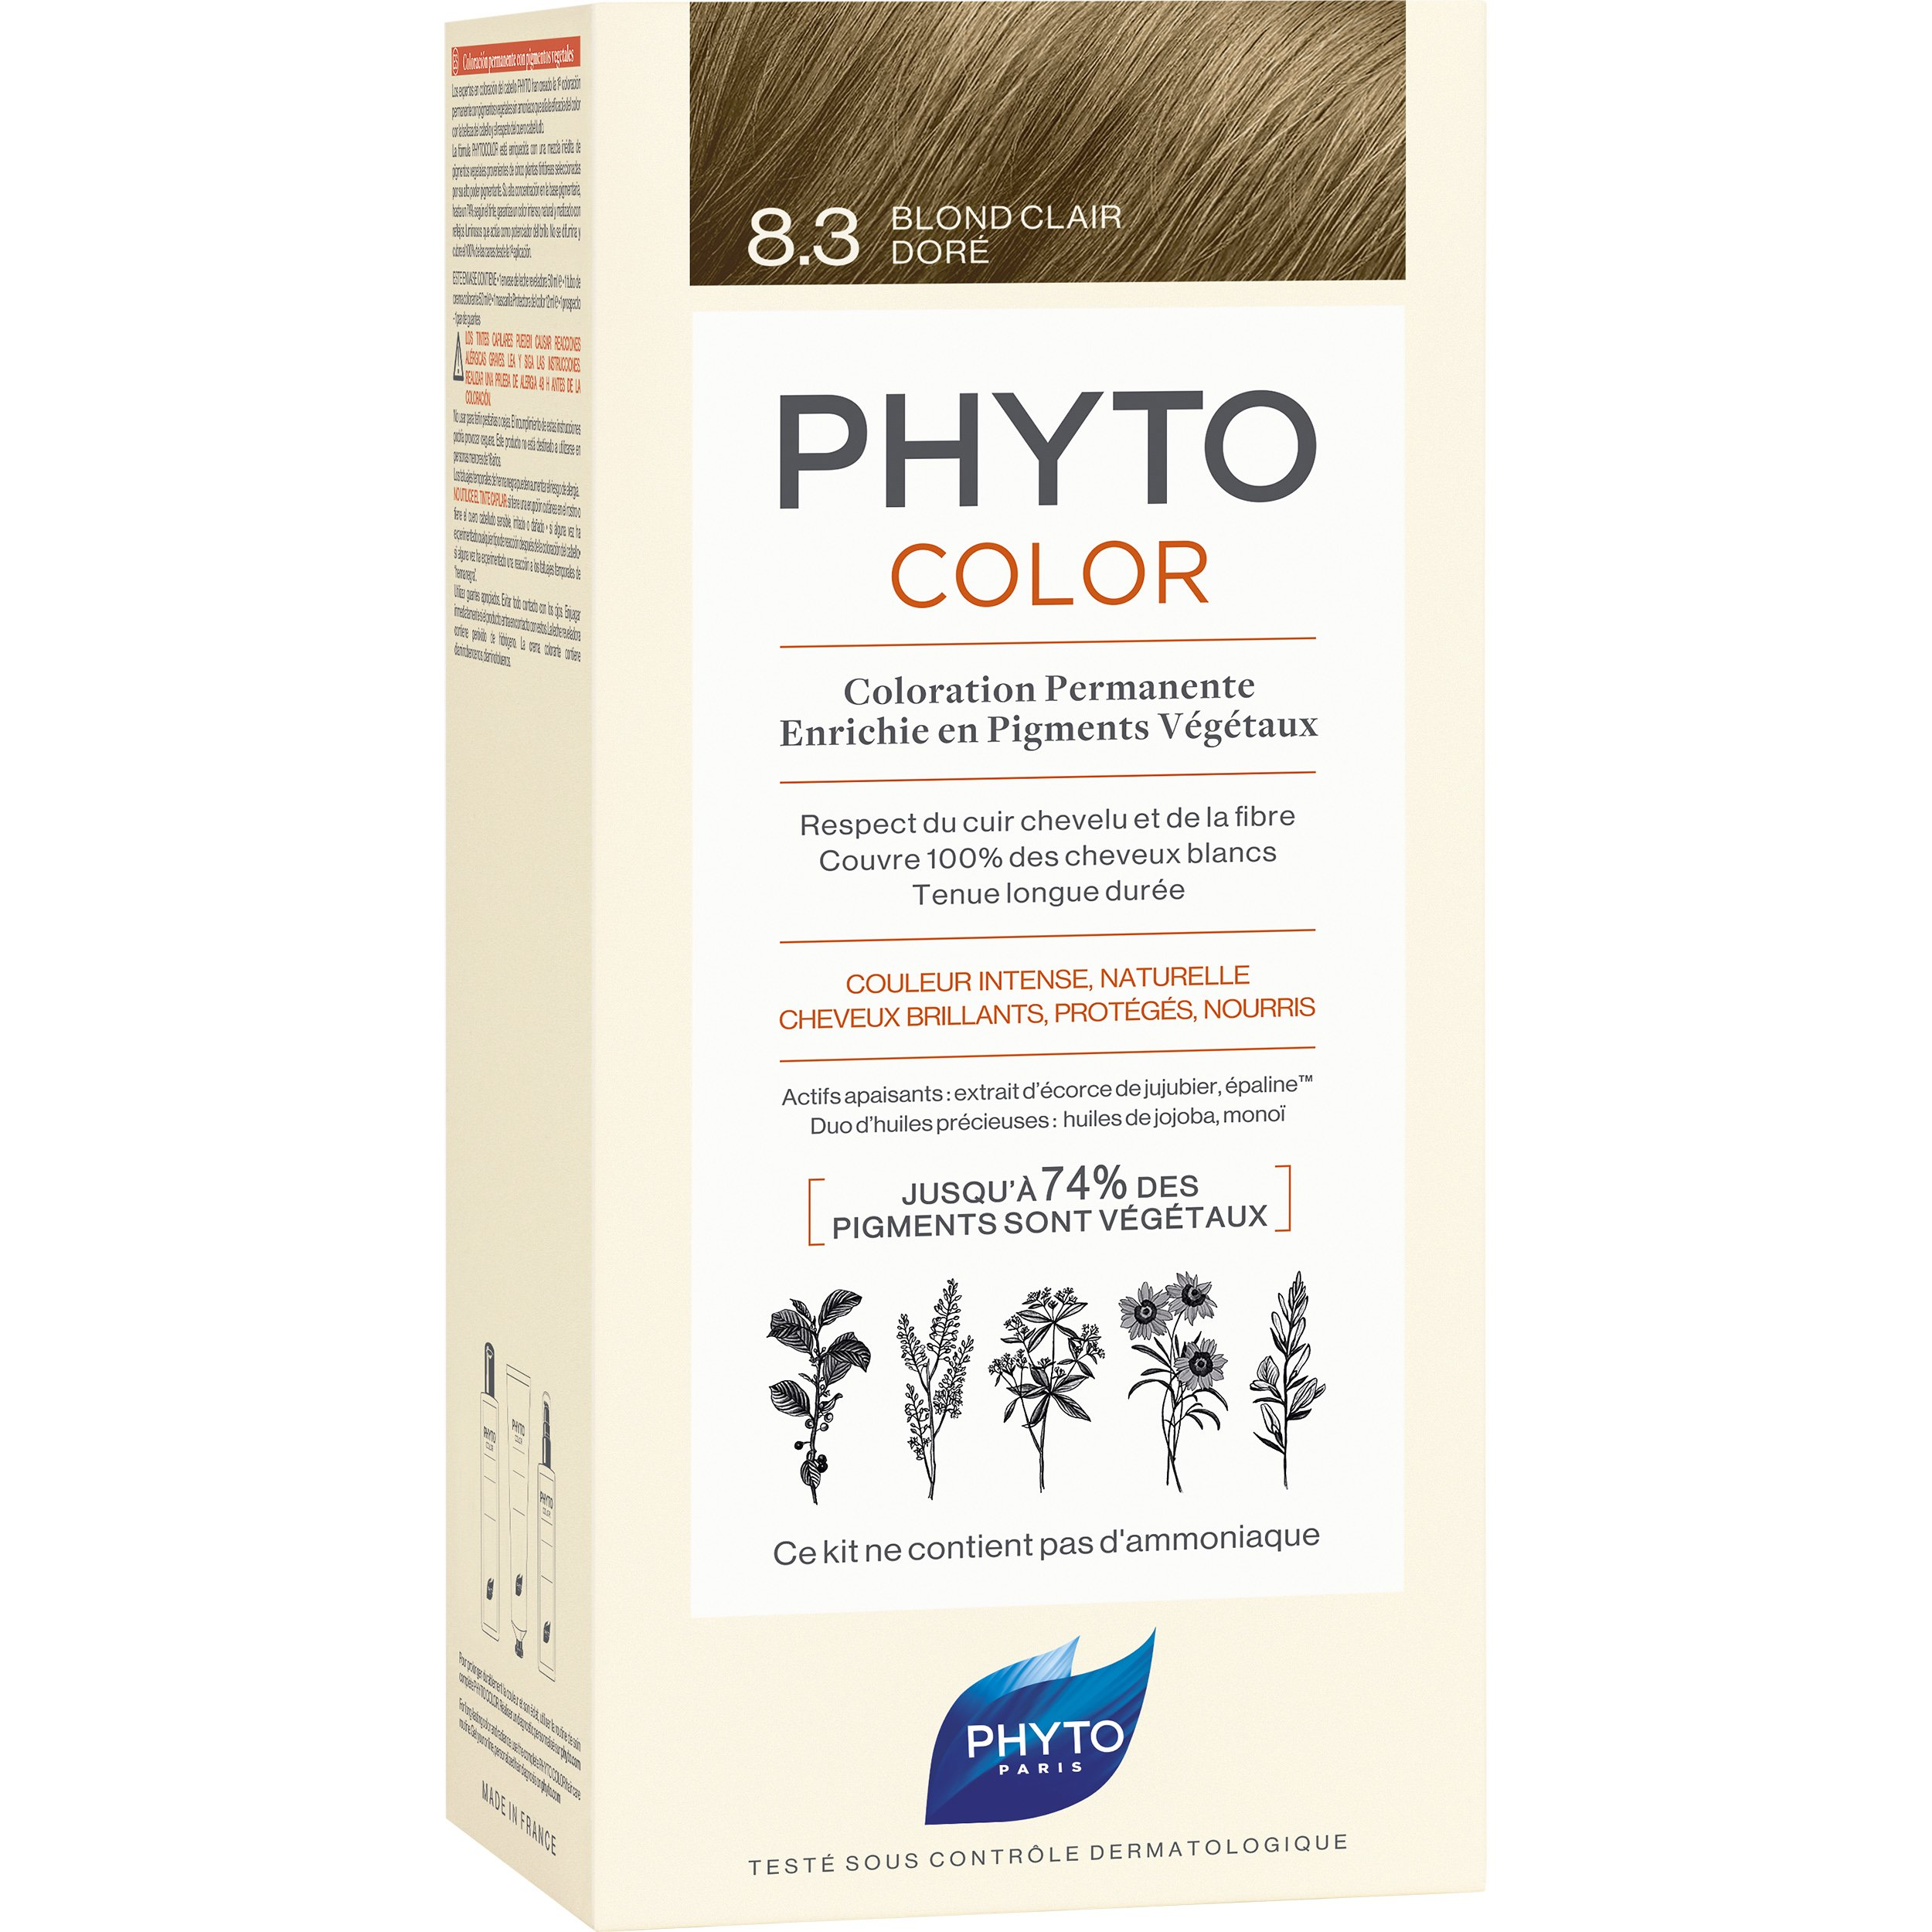 Phyto PhytoColor Coloration Permanente η No1 Μόνιμη Βαφή Μαλλιών Χωρίς Χρωστικές Ουσίες & Αμμωνία – 8.3 Ανοιχτό Ξανθό Χρυσό